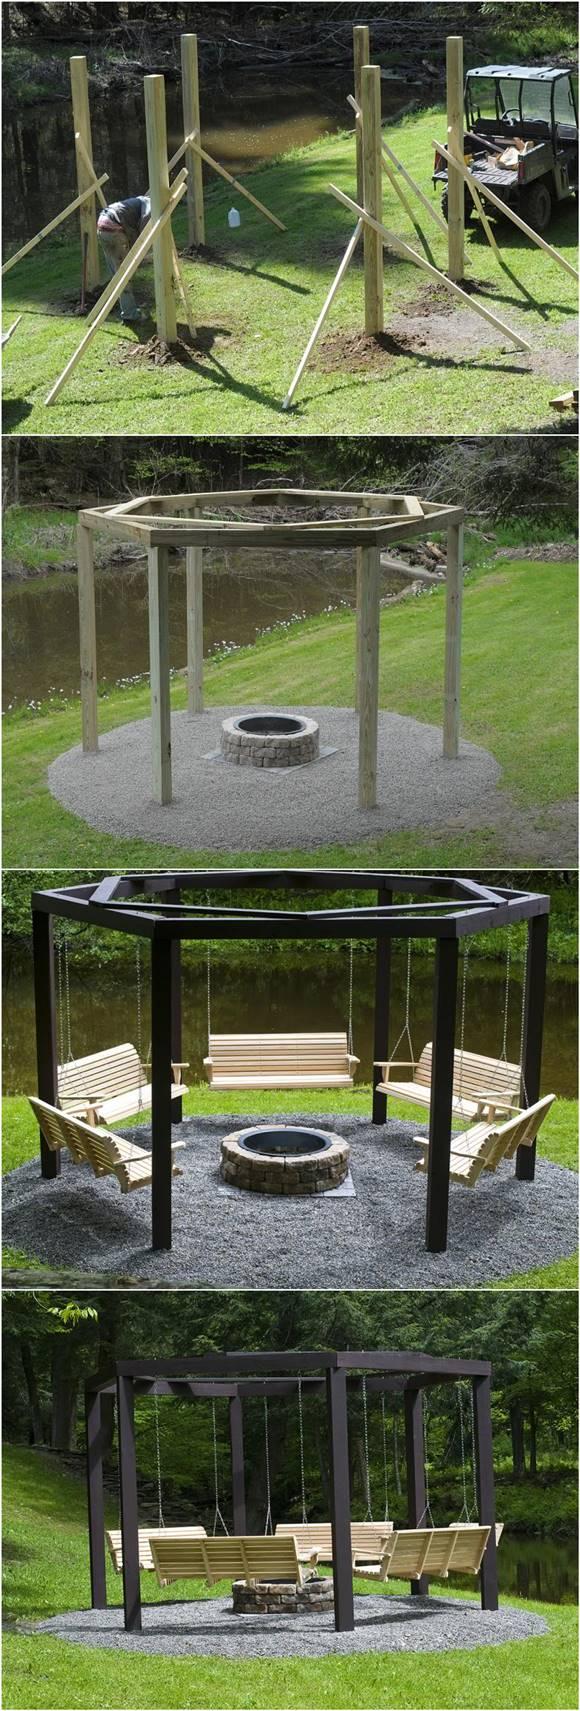 DIY Backyard Fire Pit with Swing Seats | iCreativeIdeas.com